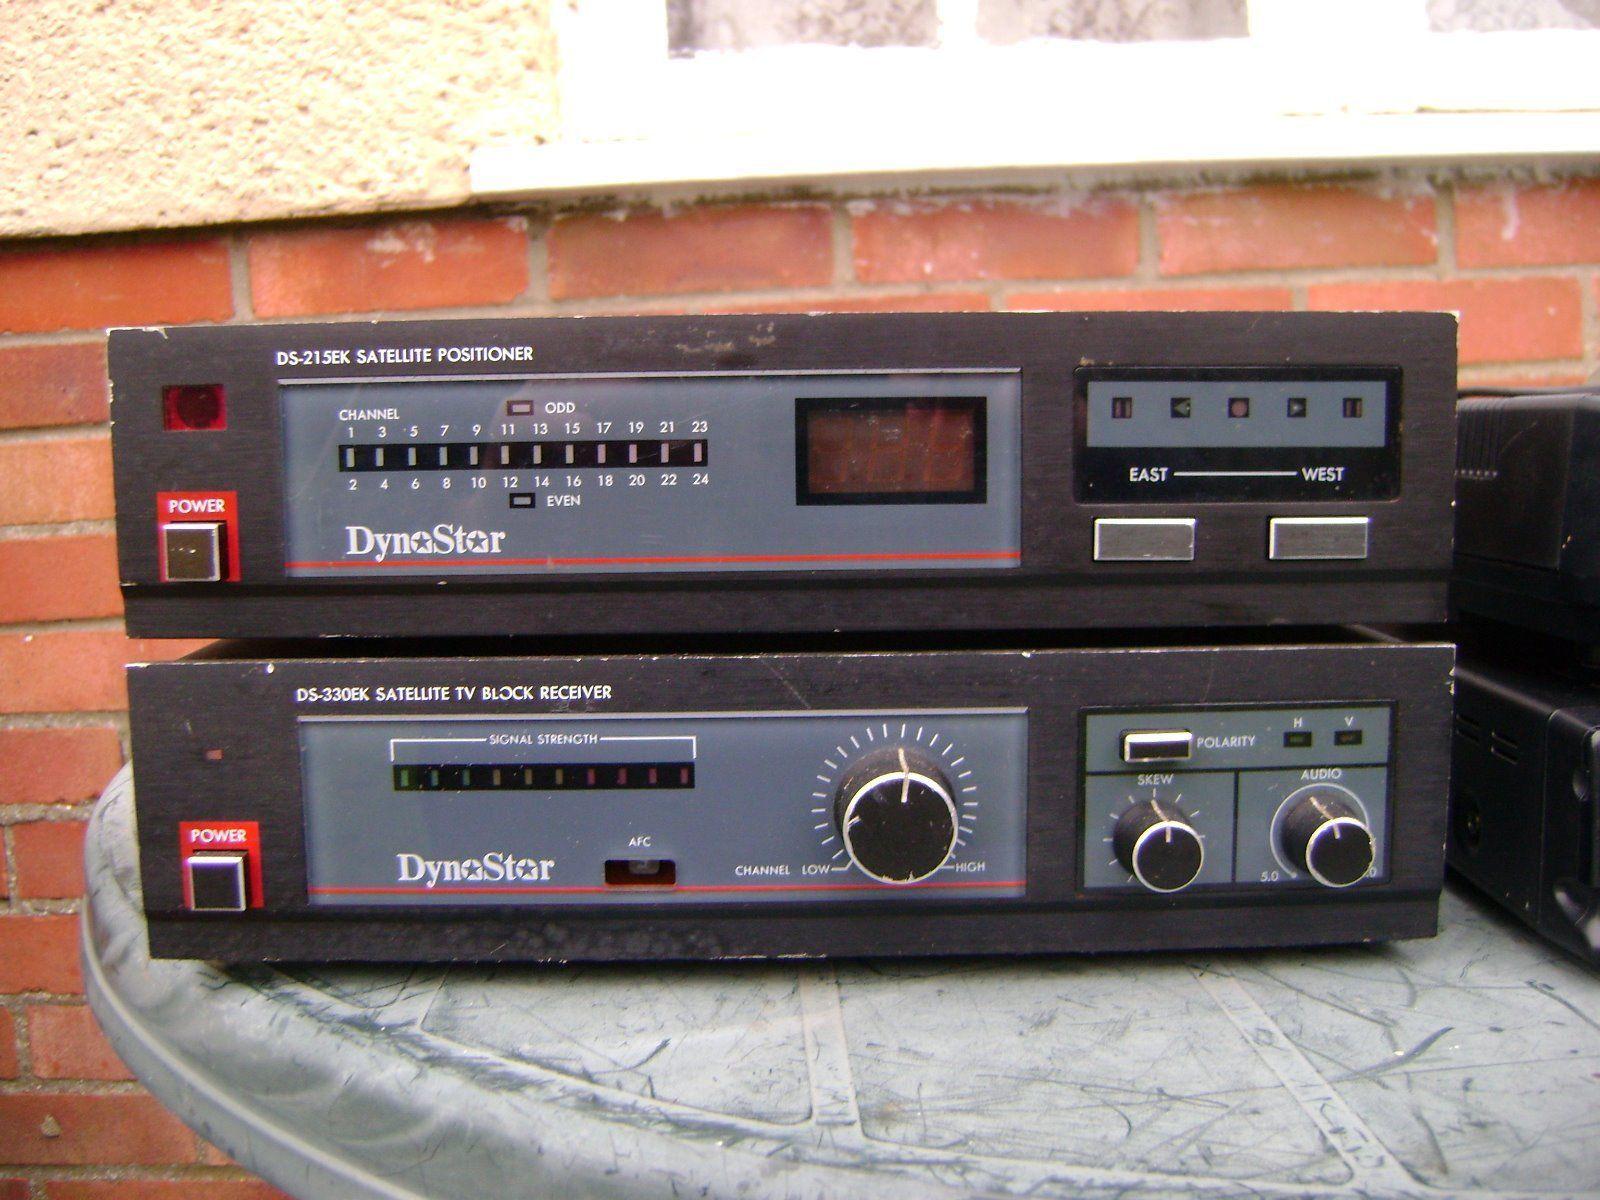 dynostar satellite receiver goodmans st700 analogue satellite rh pinterest com Grundig Majestic Console Grundig Console Stereo with Turntable